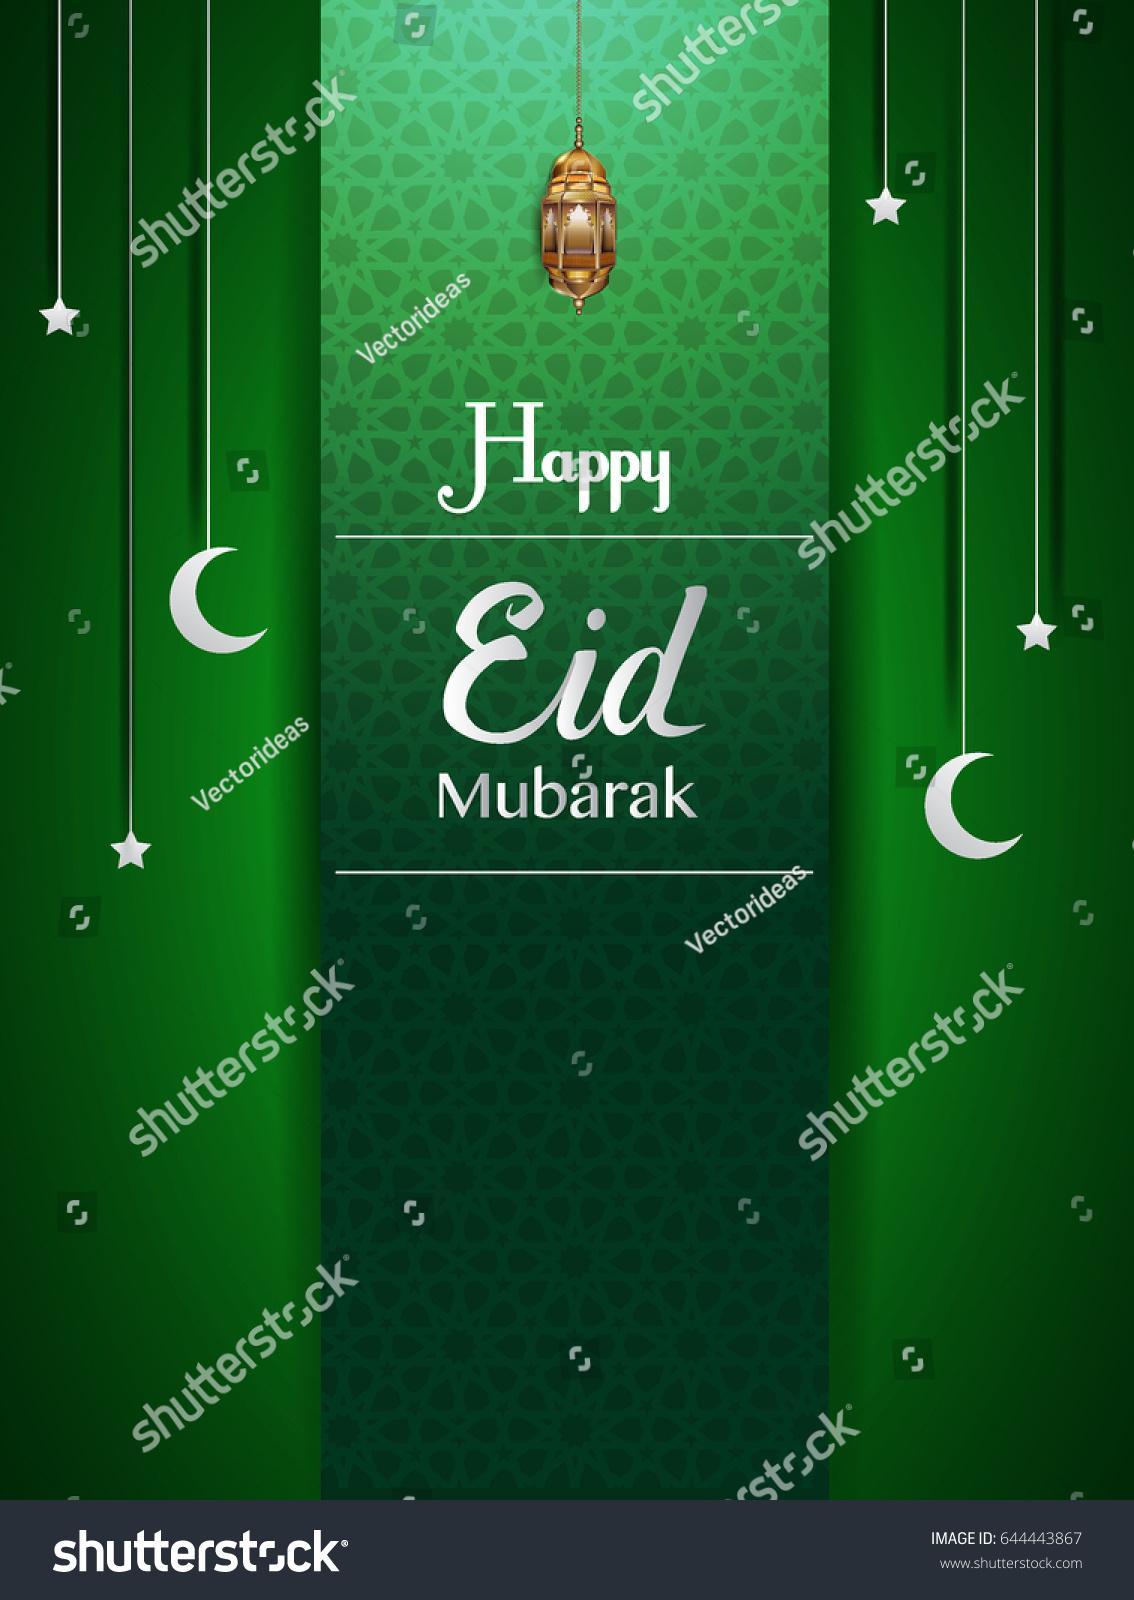 Happy Eid Mubarak Greetings Background Elegant Stock Vector